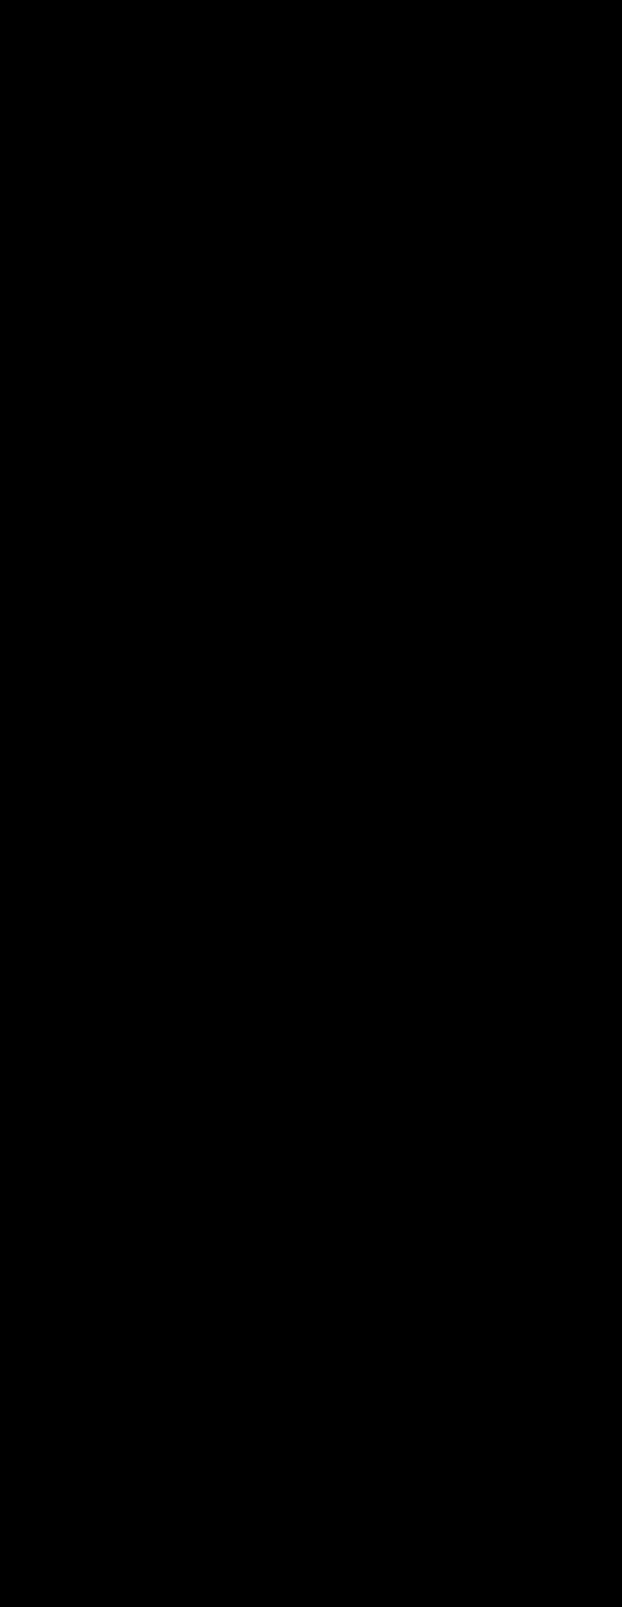 image123.png